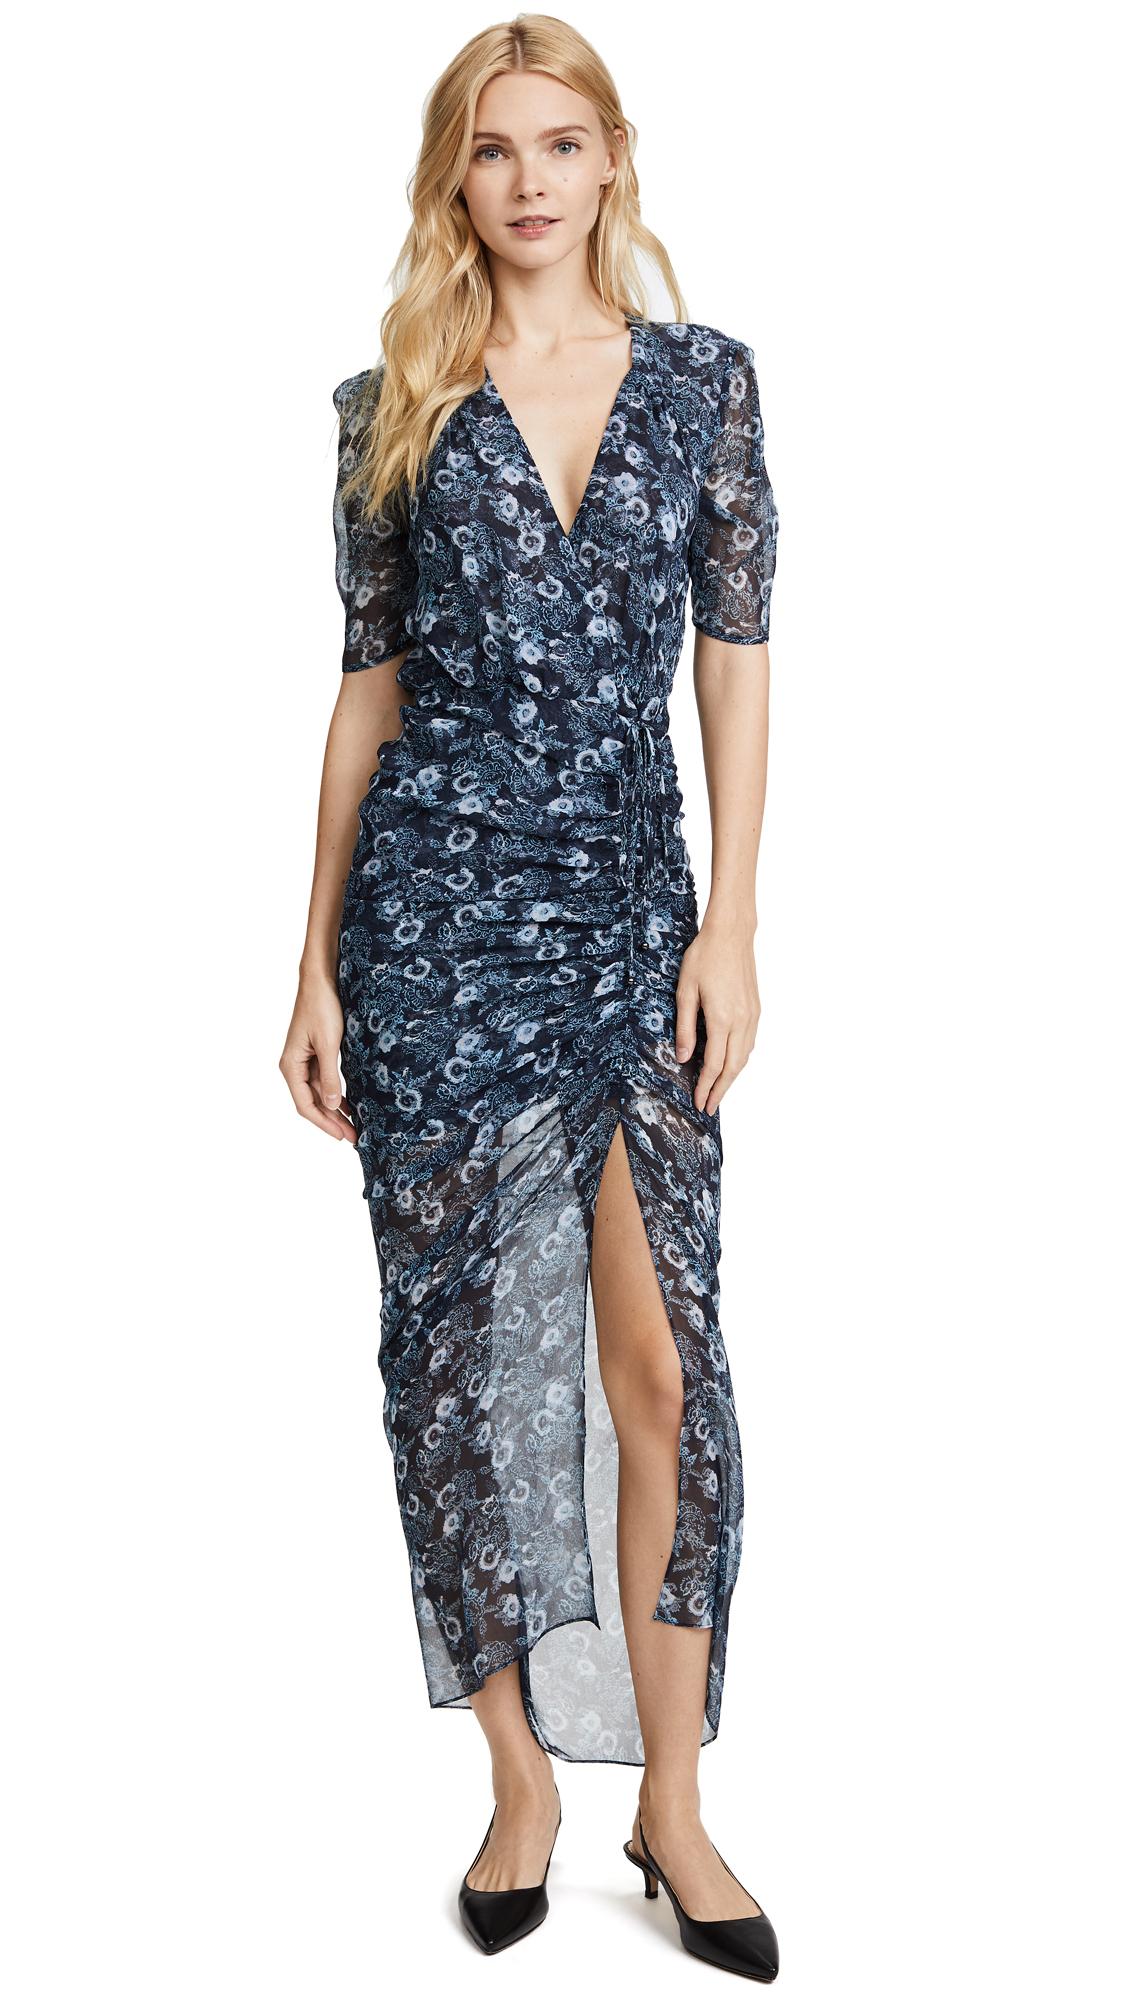 Veronica Beard Mariposa Midi Dress - Blue